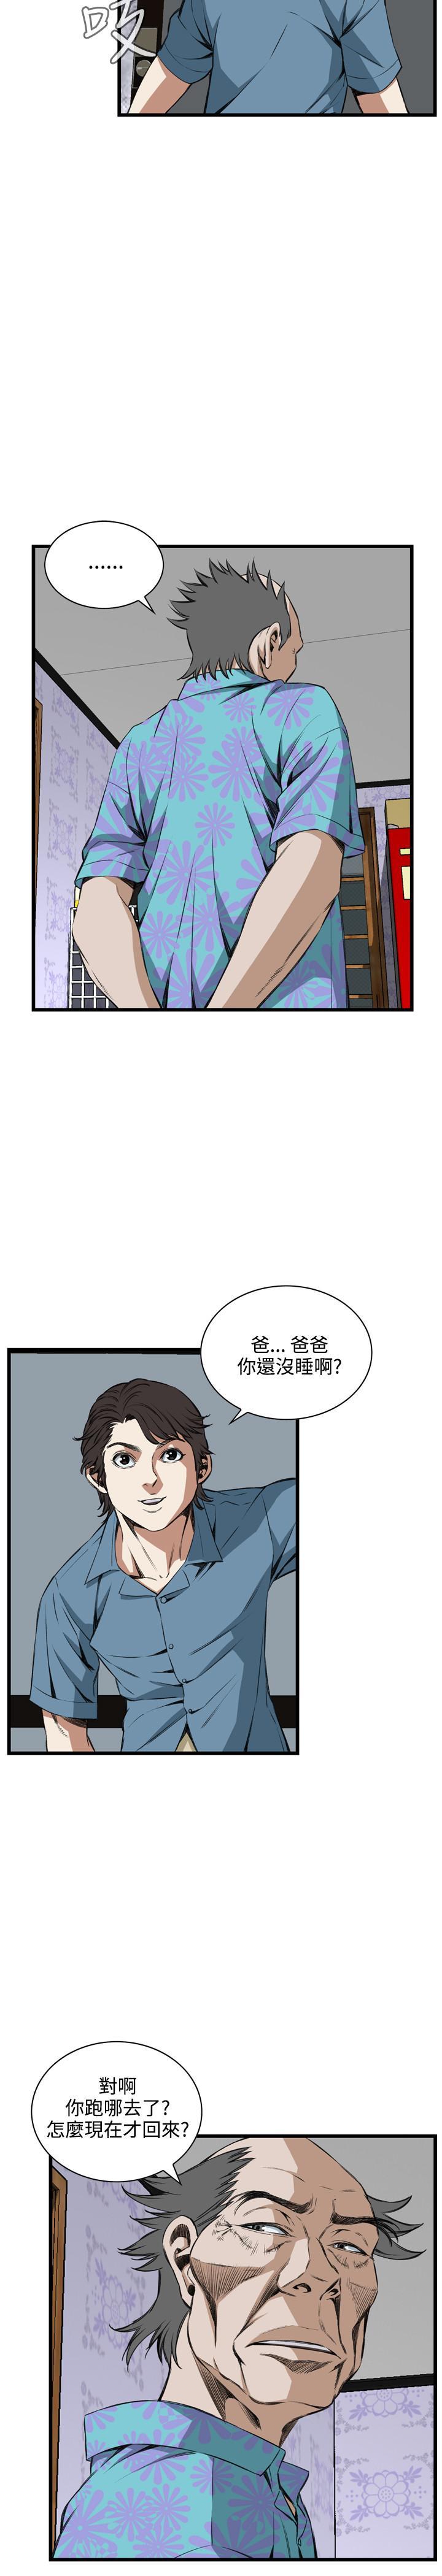 Take a Peek 偷窥 Ch.39~60 [Chinese]中文 655